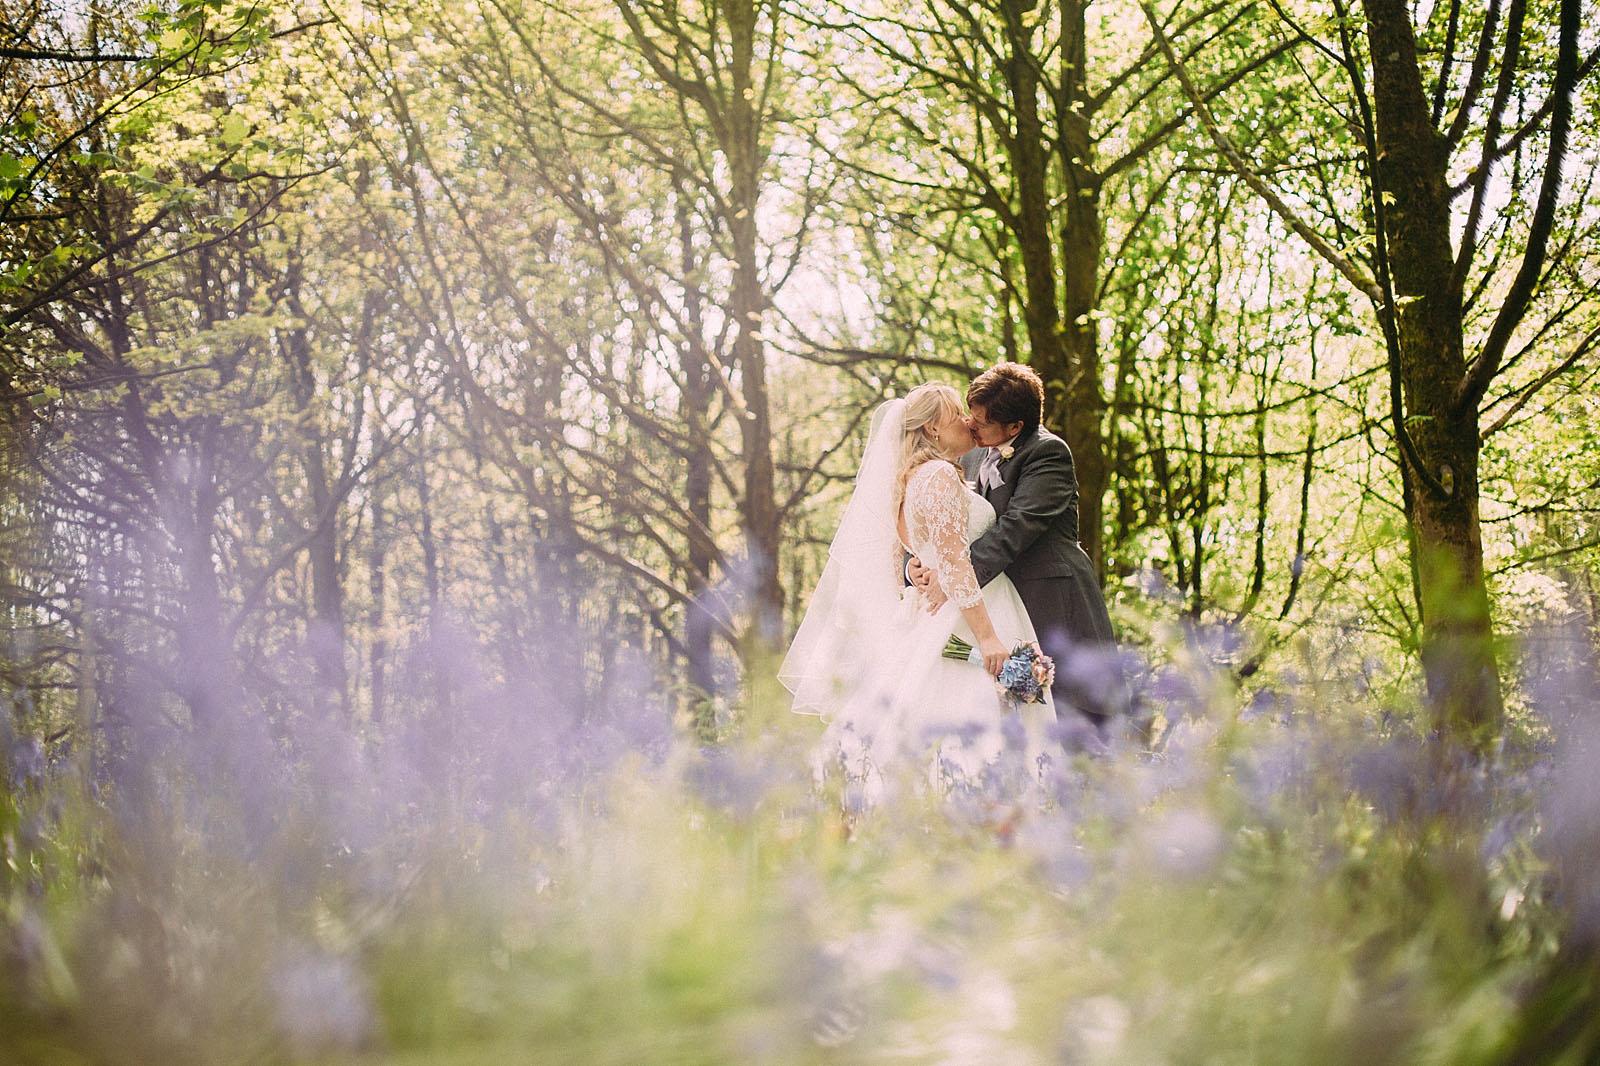 Lawson_Best_Wedding_2015_196